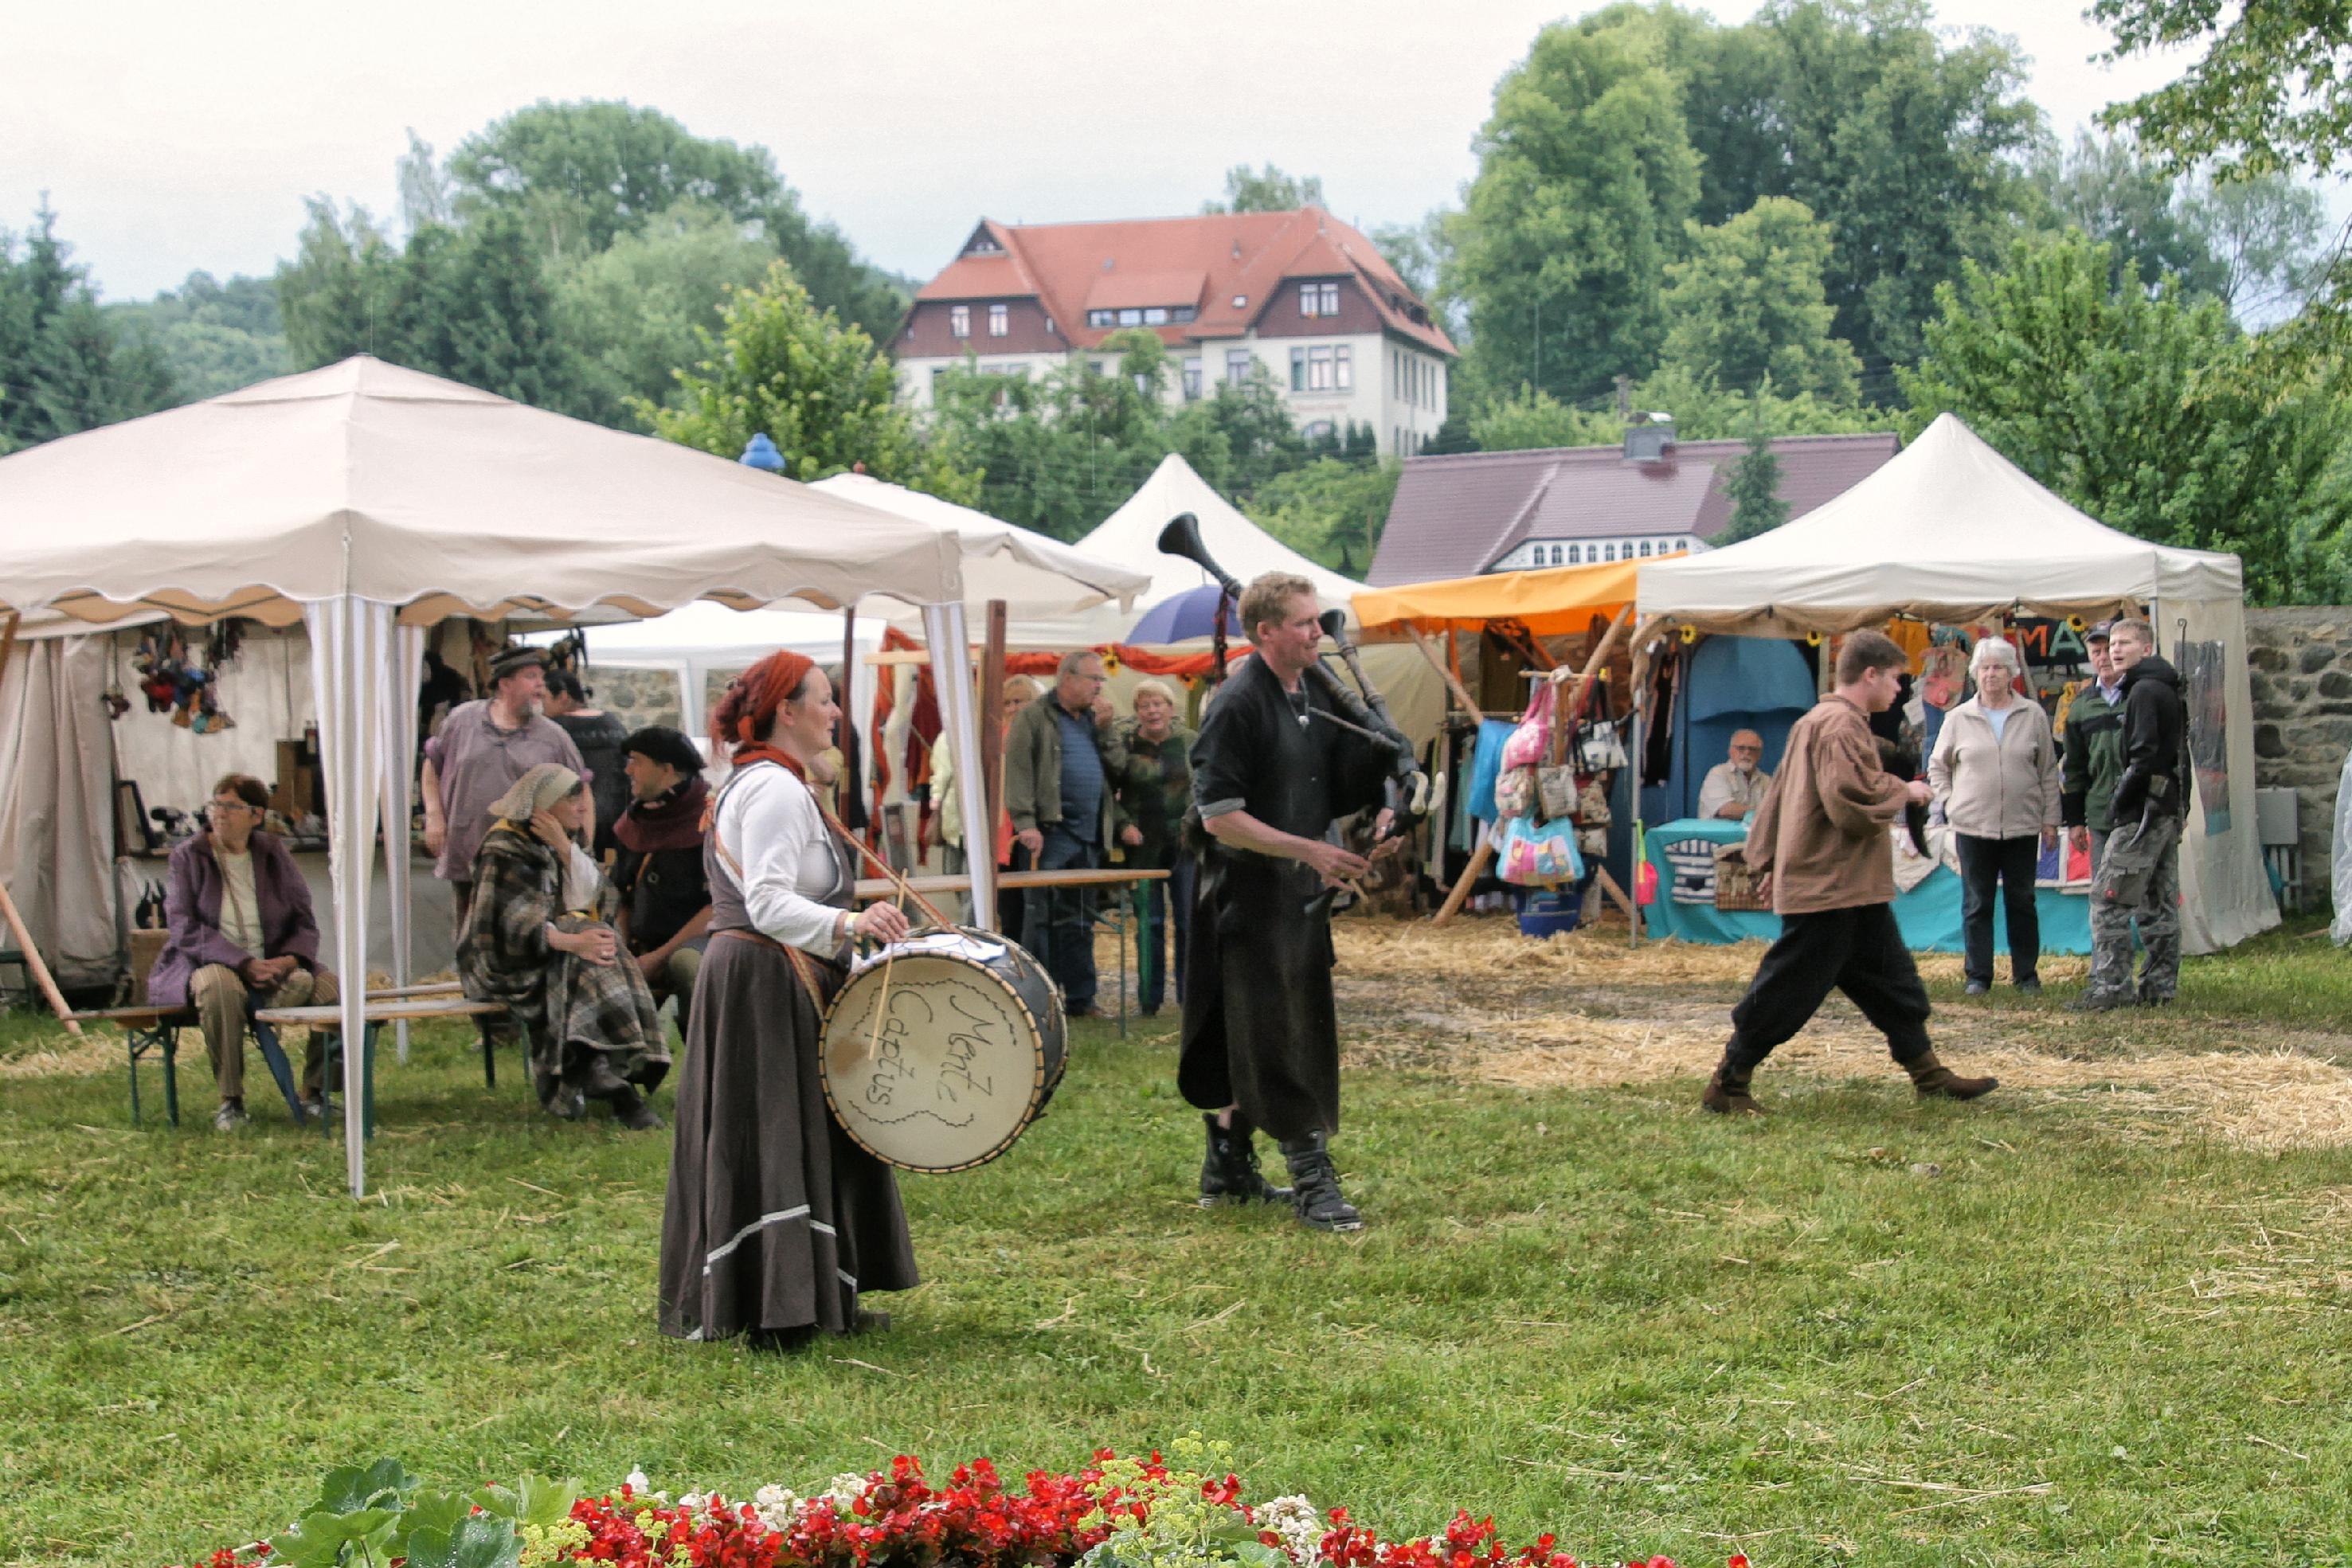 IMG_9050Schlossfest-Hainewalde-2016